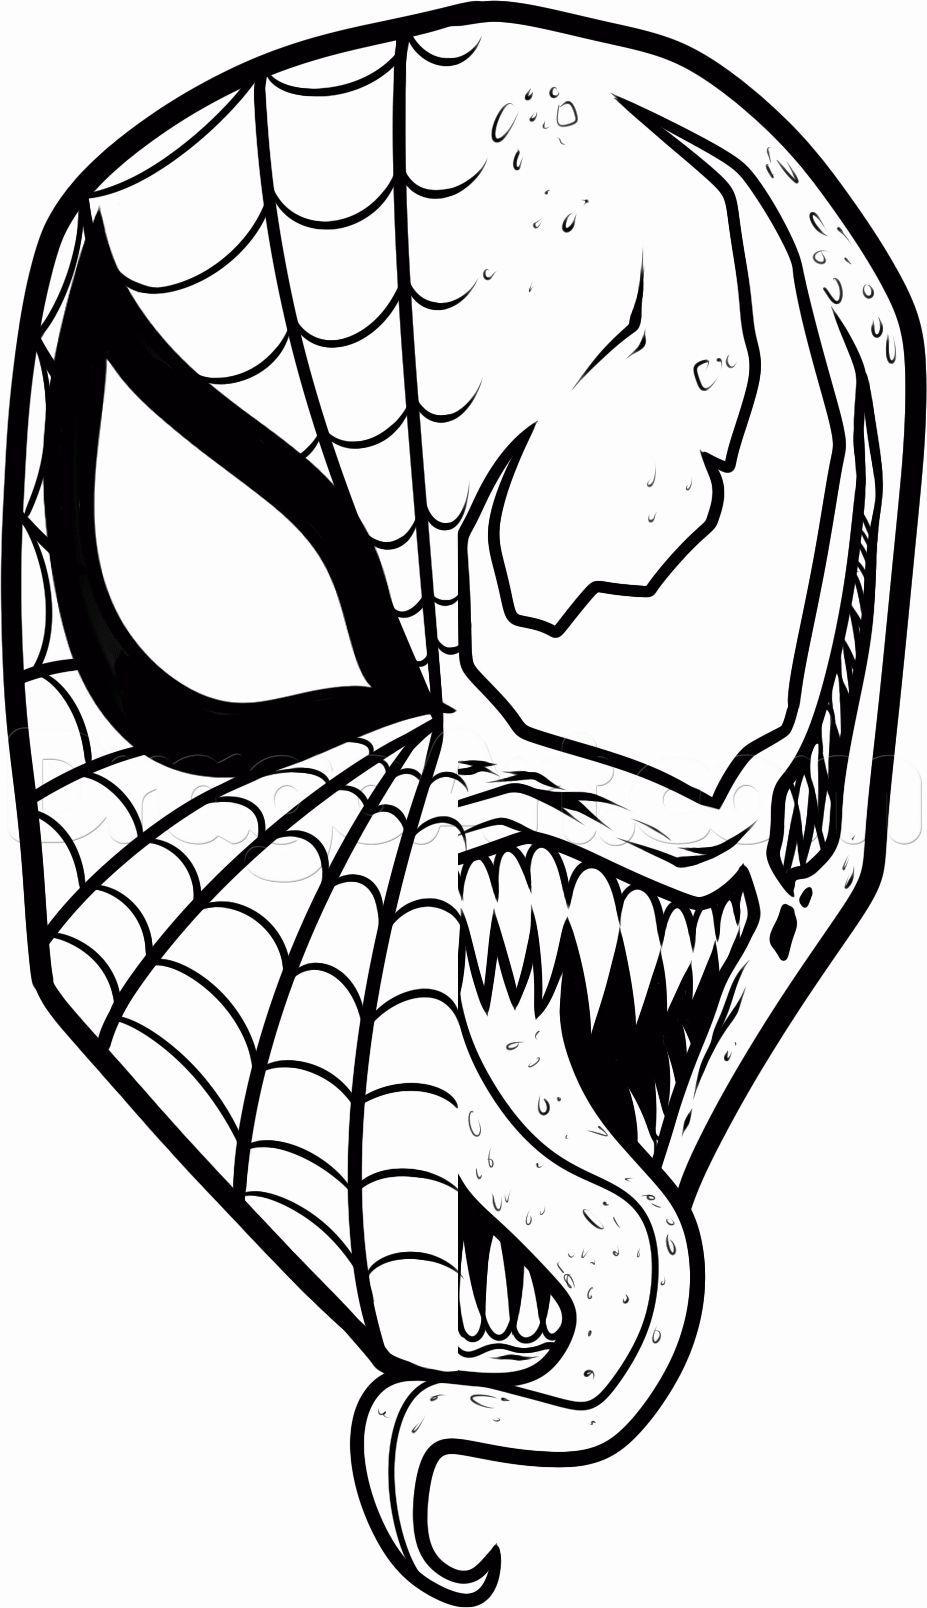 Lego Coloring Activities Best Of Batman Logo Coloring Pages And Superhero Kepek Best Of 242 Best Spiderman Drawing Spiderman Painting Marvel Drawings